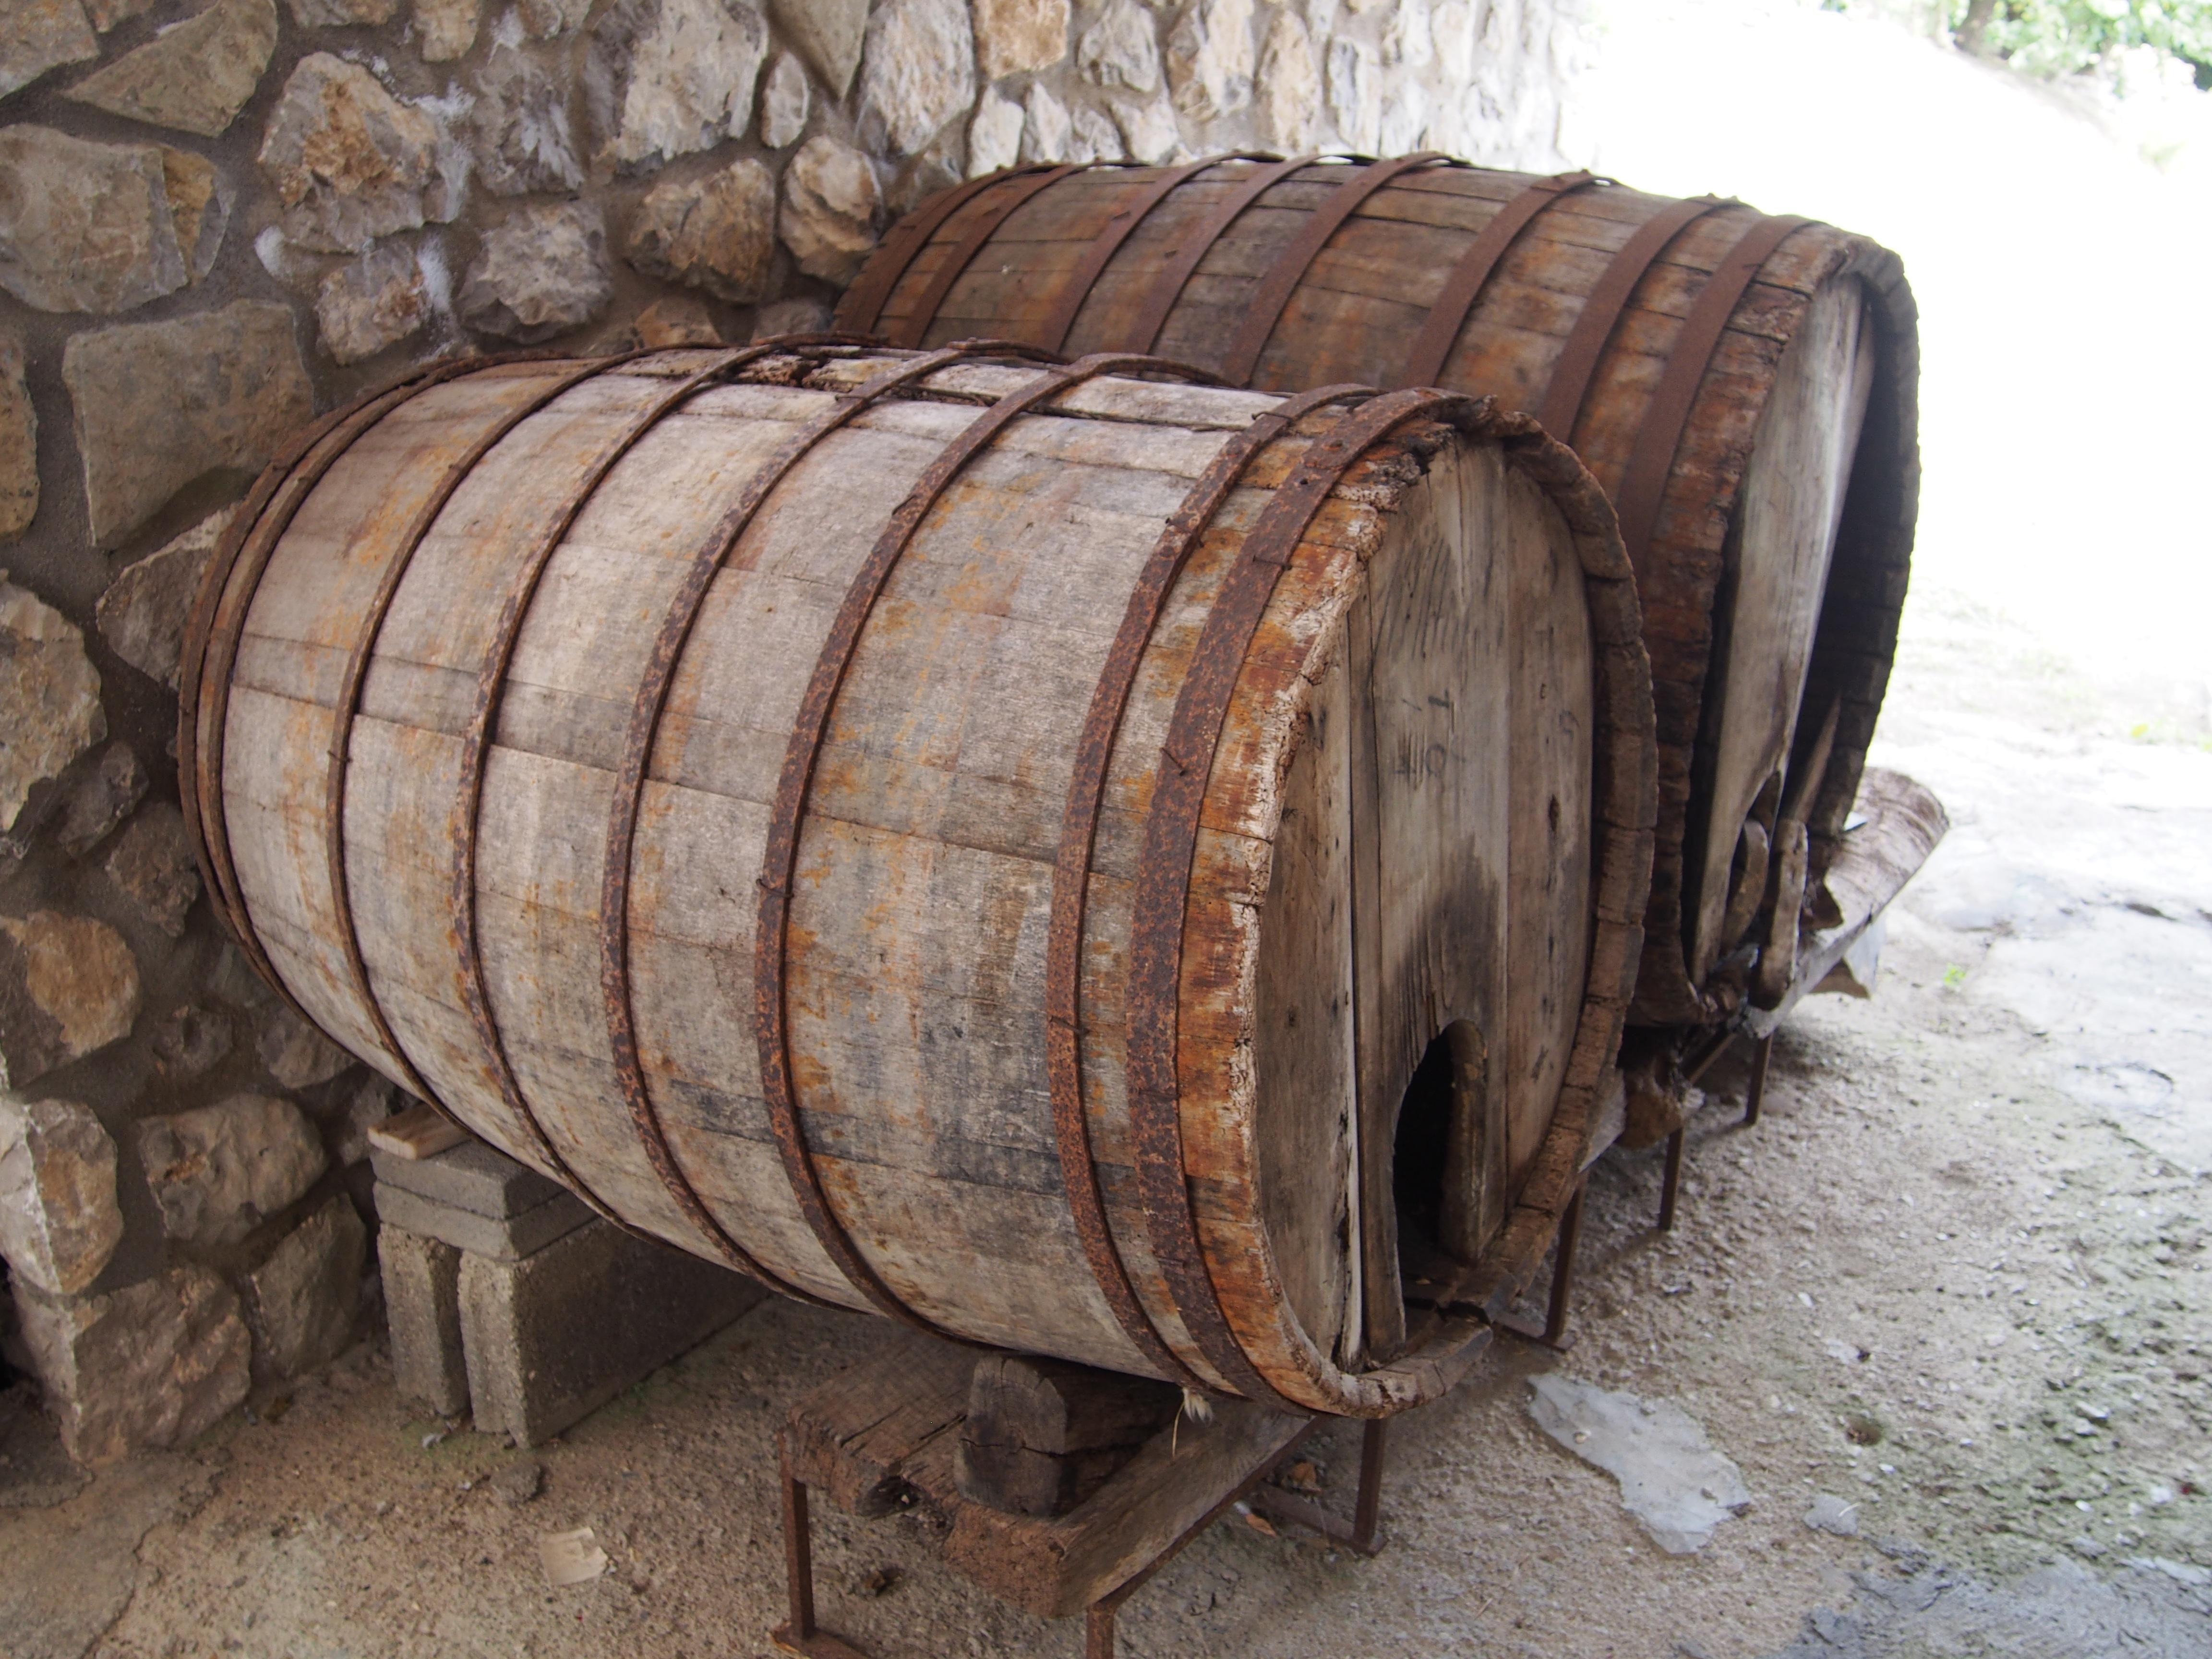 Wood Wine Old Drum Barrel Storage Wooden Barrels Man Made Object Skin Head  Percussion Instrument Storage